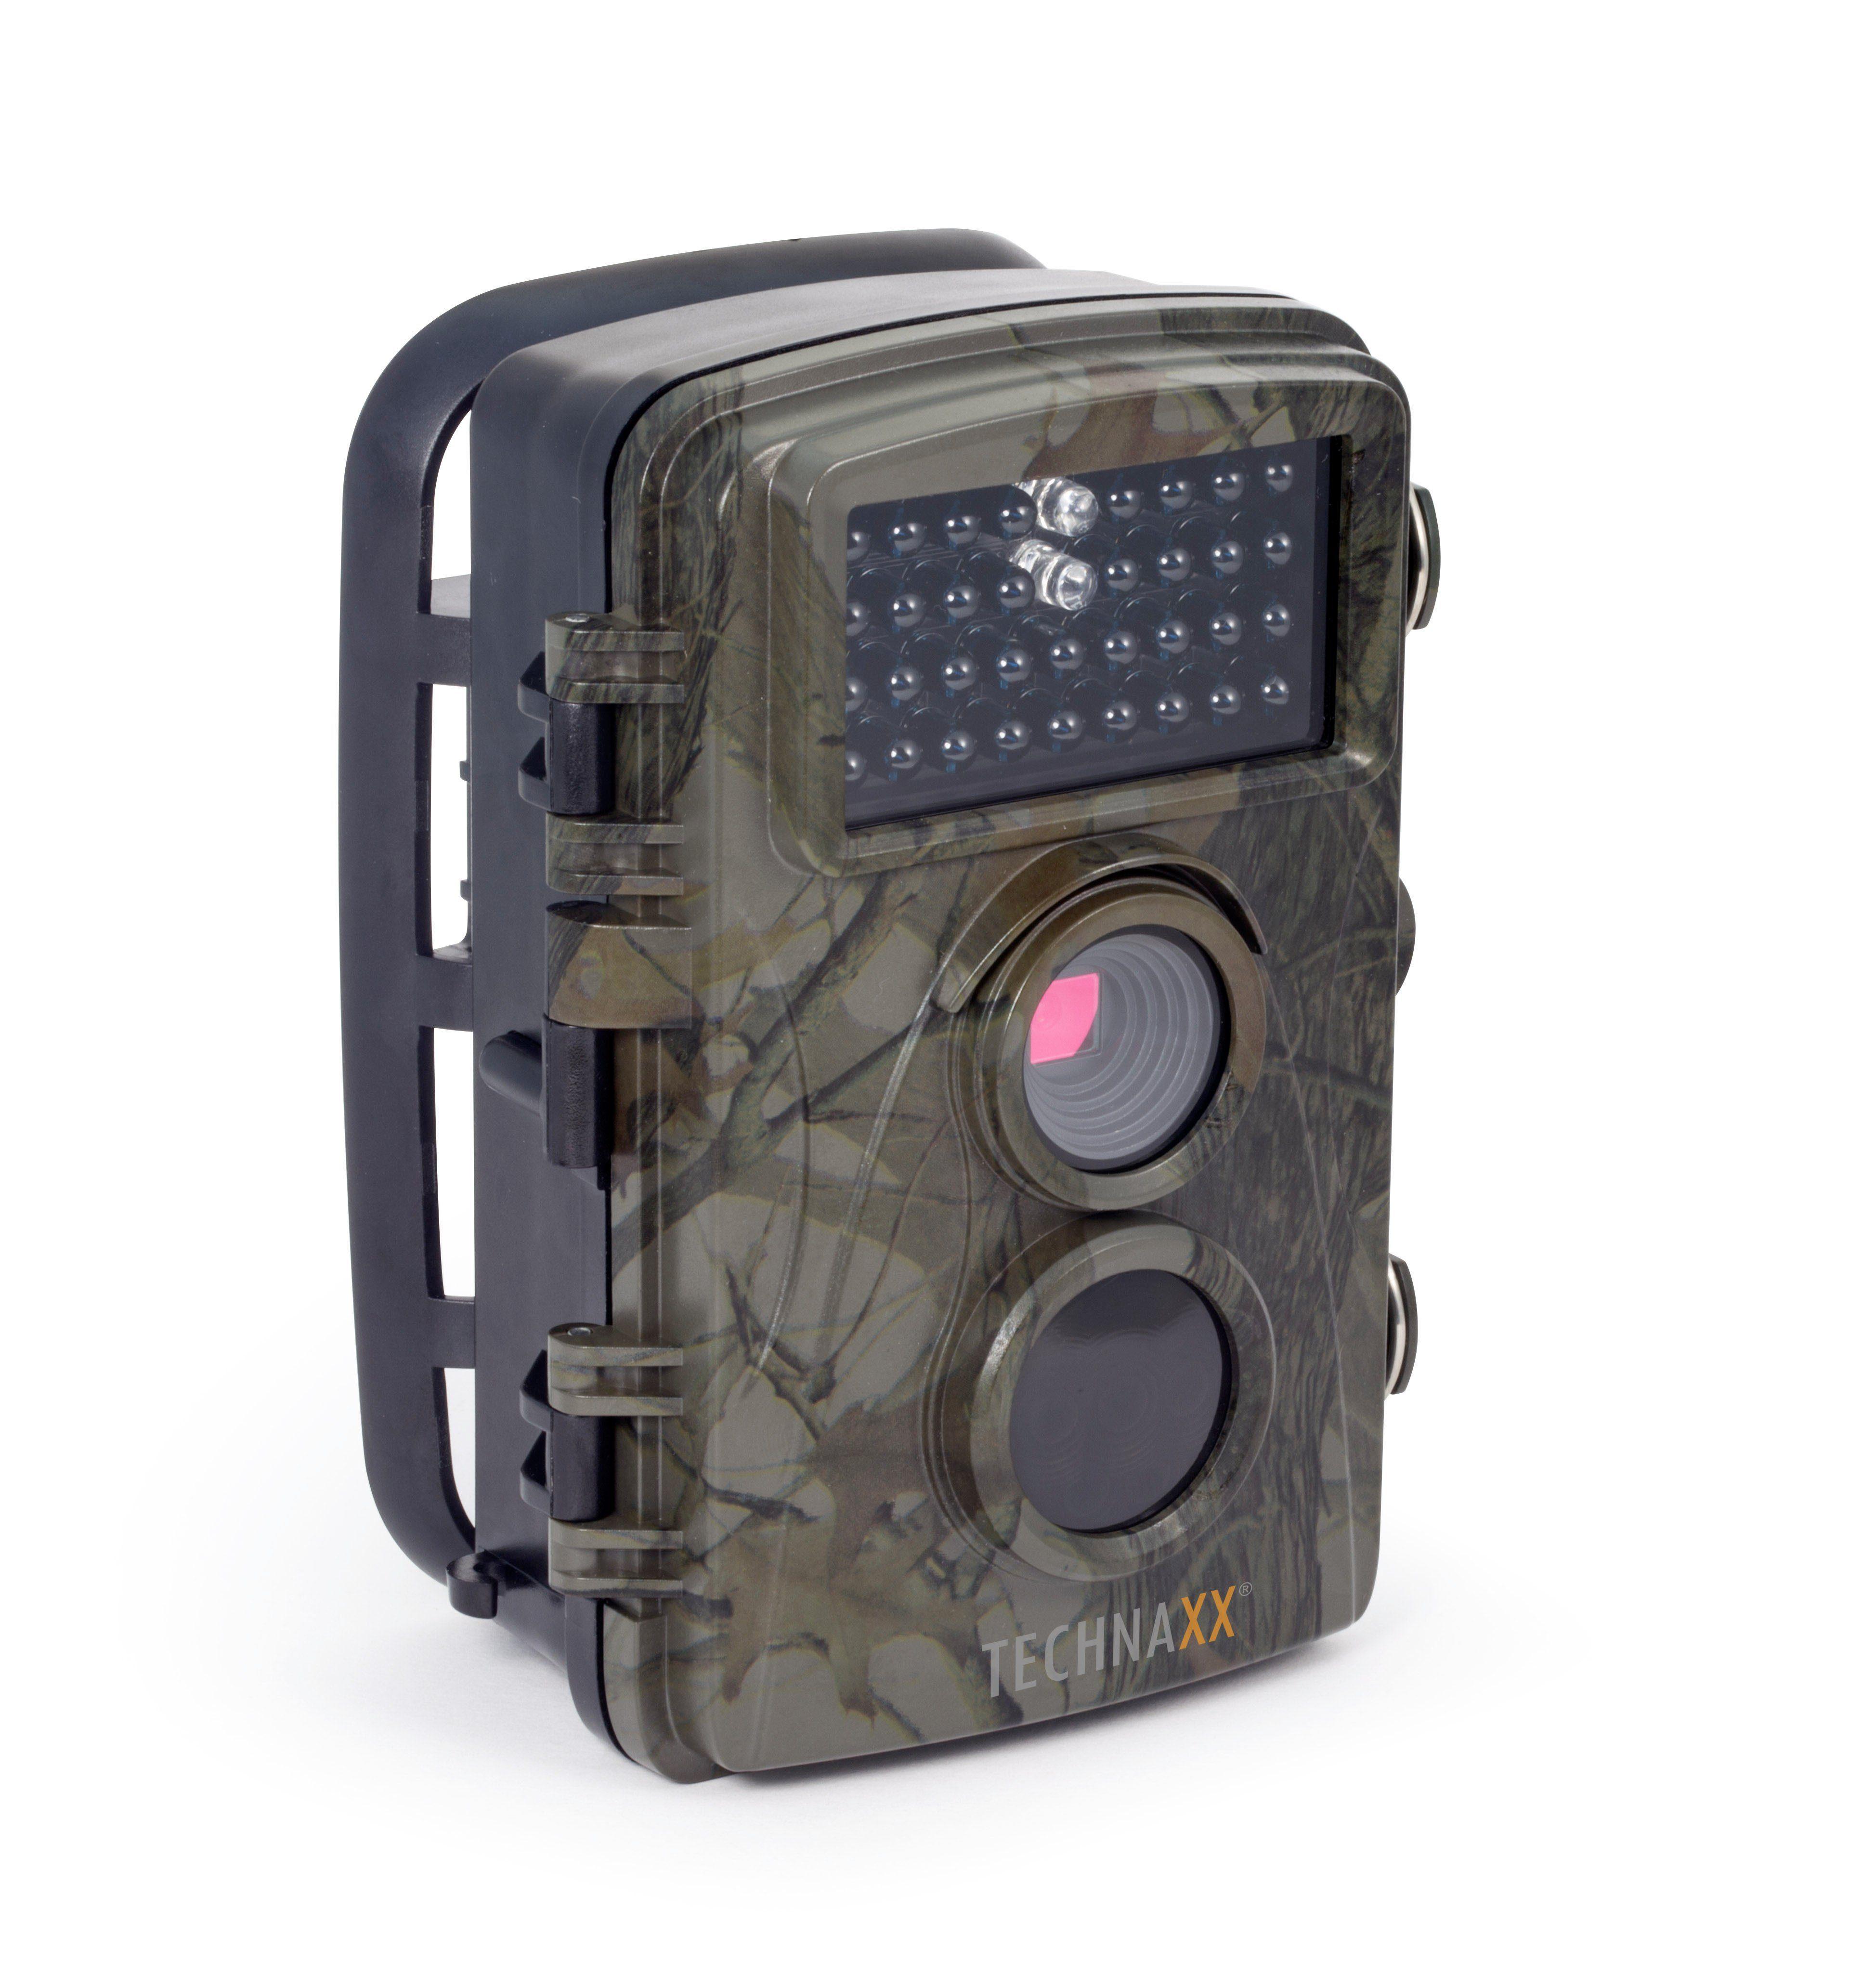 Technaxx Digitale Videokamera »Technaxx Nature Wild Cam TX-69«